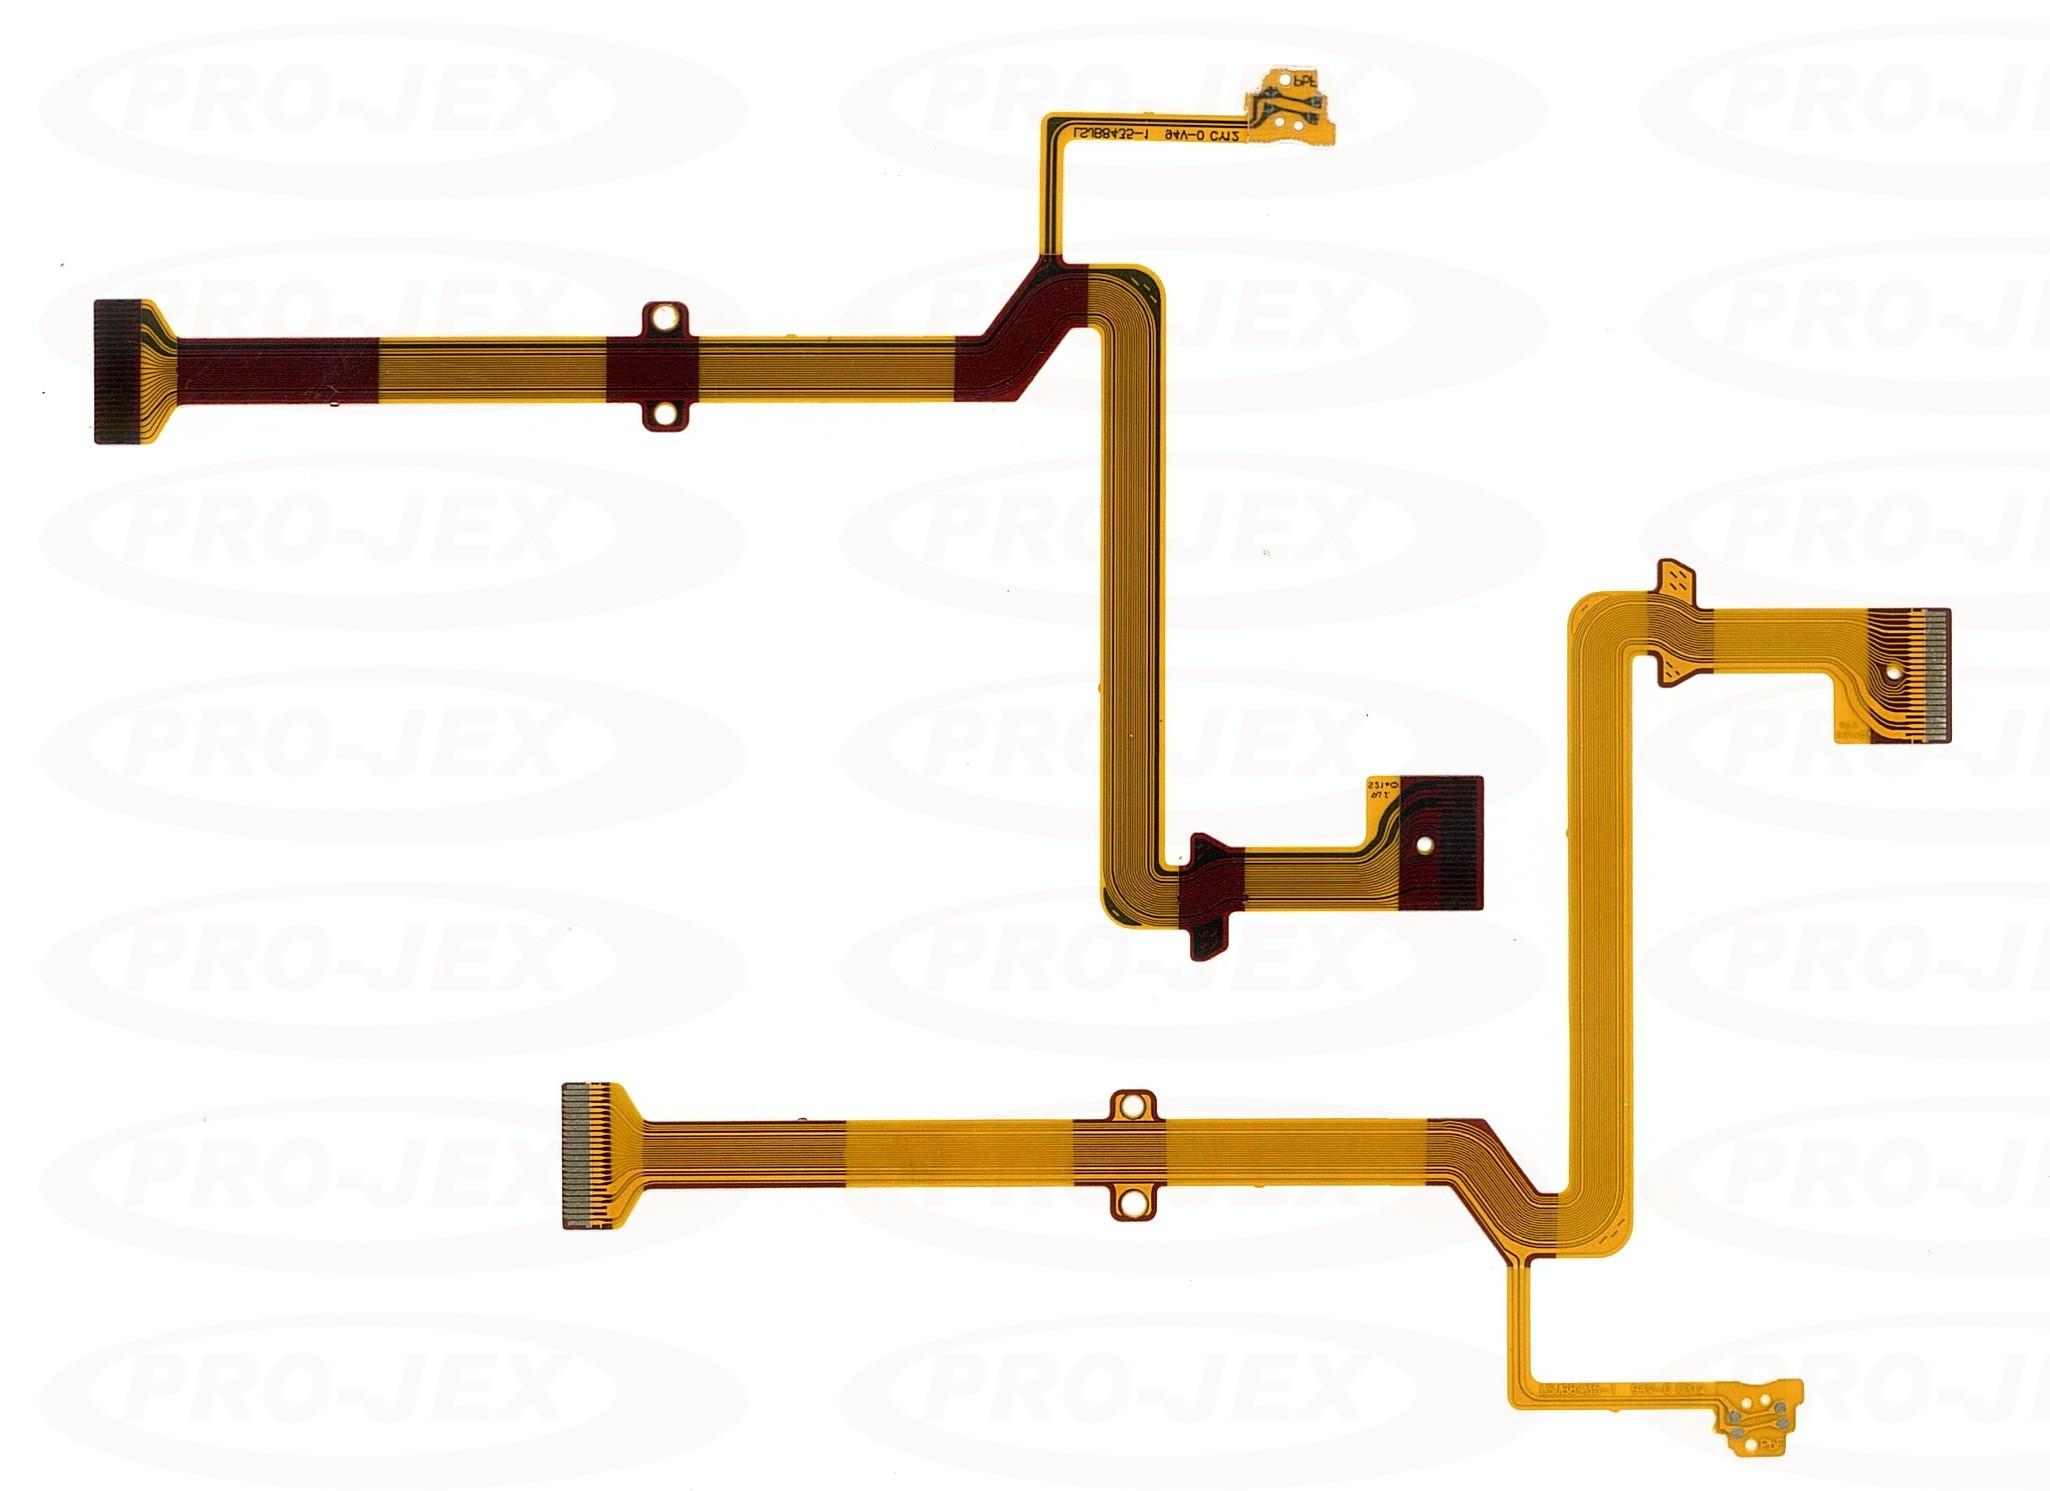 Panasonic NV-GS90 NV-GS98 PV-GS90 PV-GS98 LCD Flex